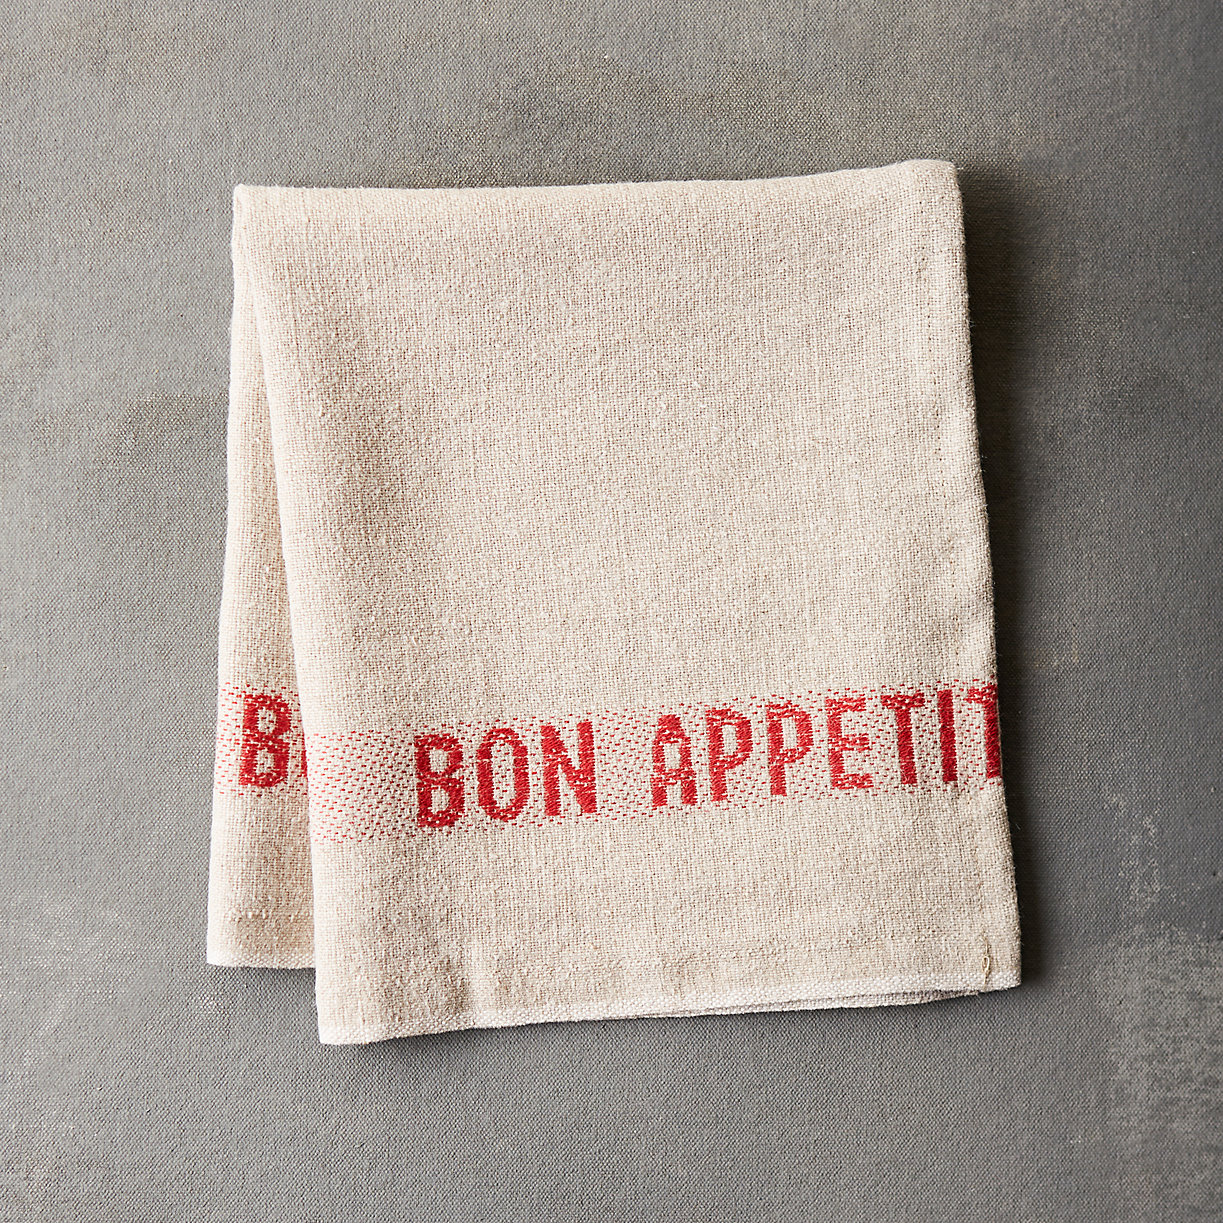 Linen Wedding Anniversary Gifts, Linen Napkins